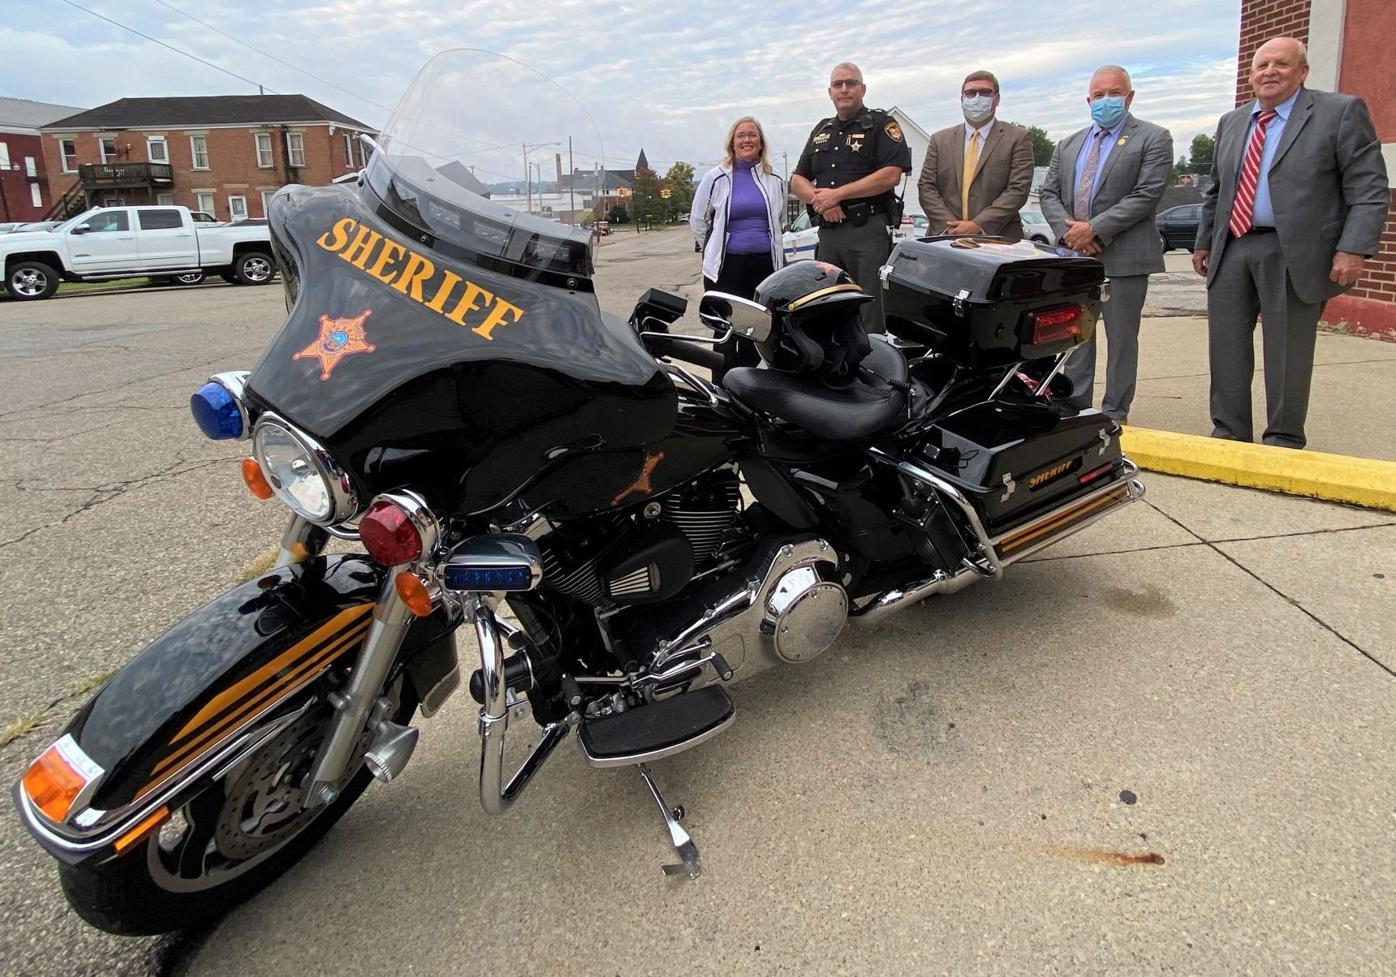 2009 Harley Davidson - group photo